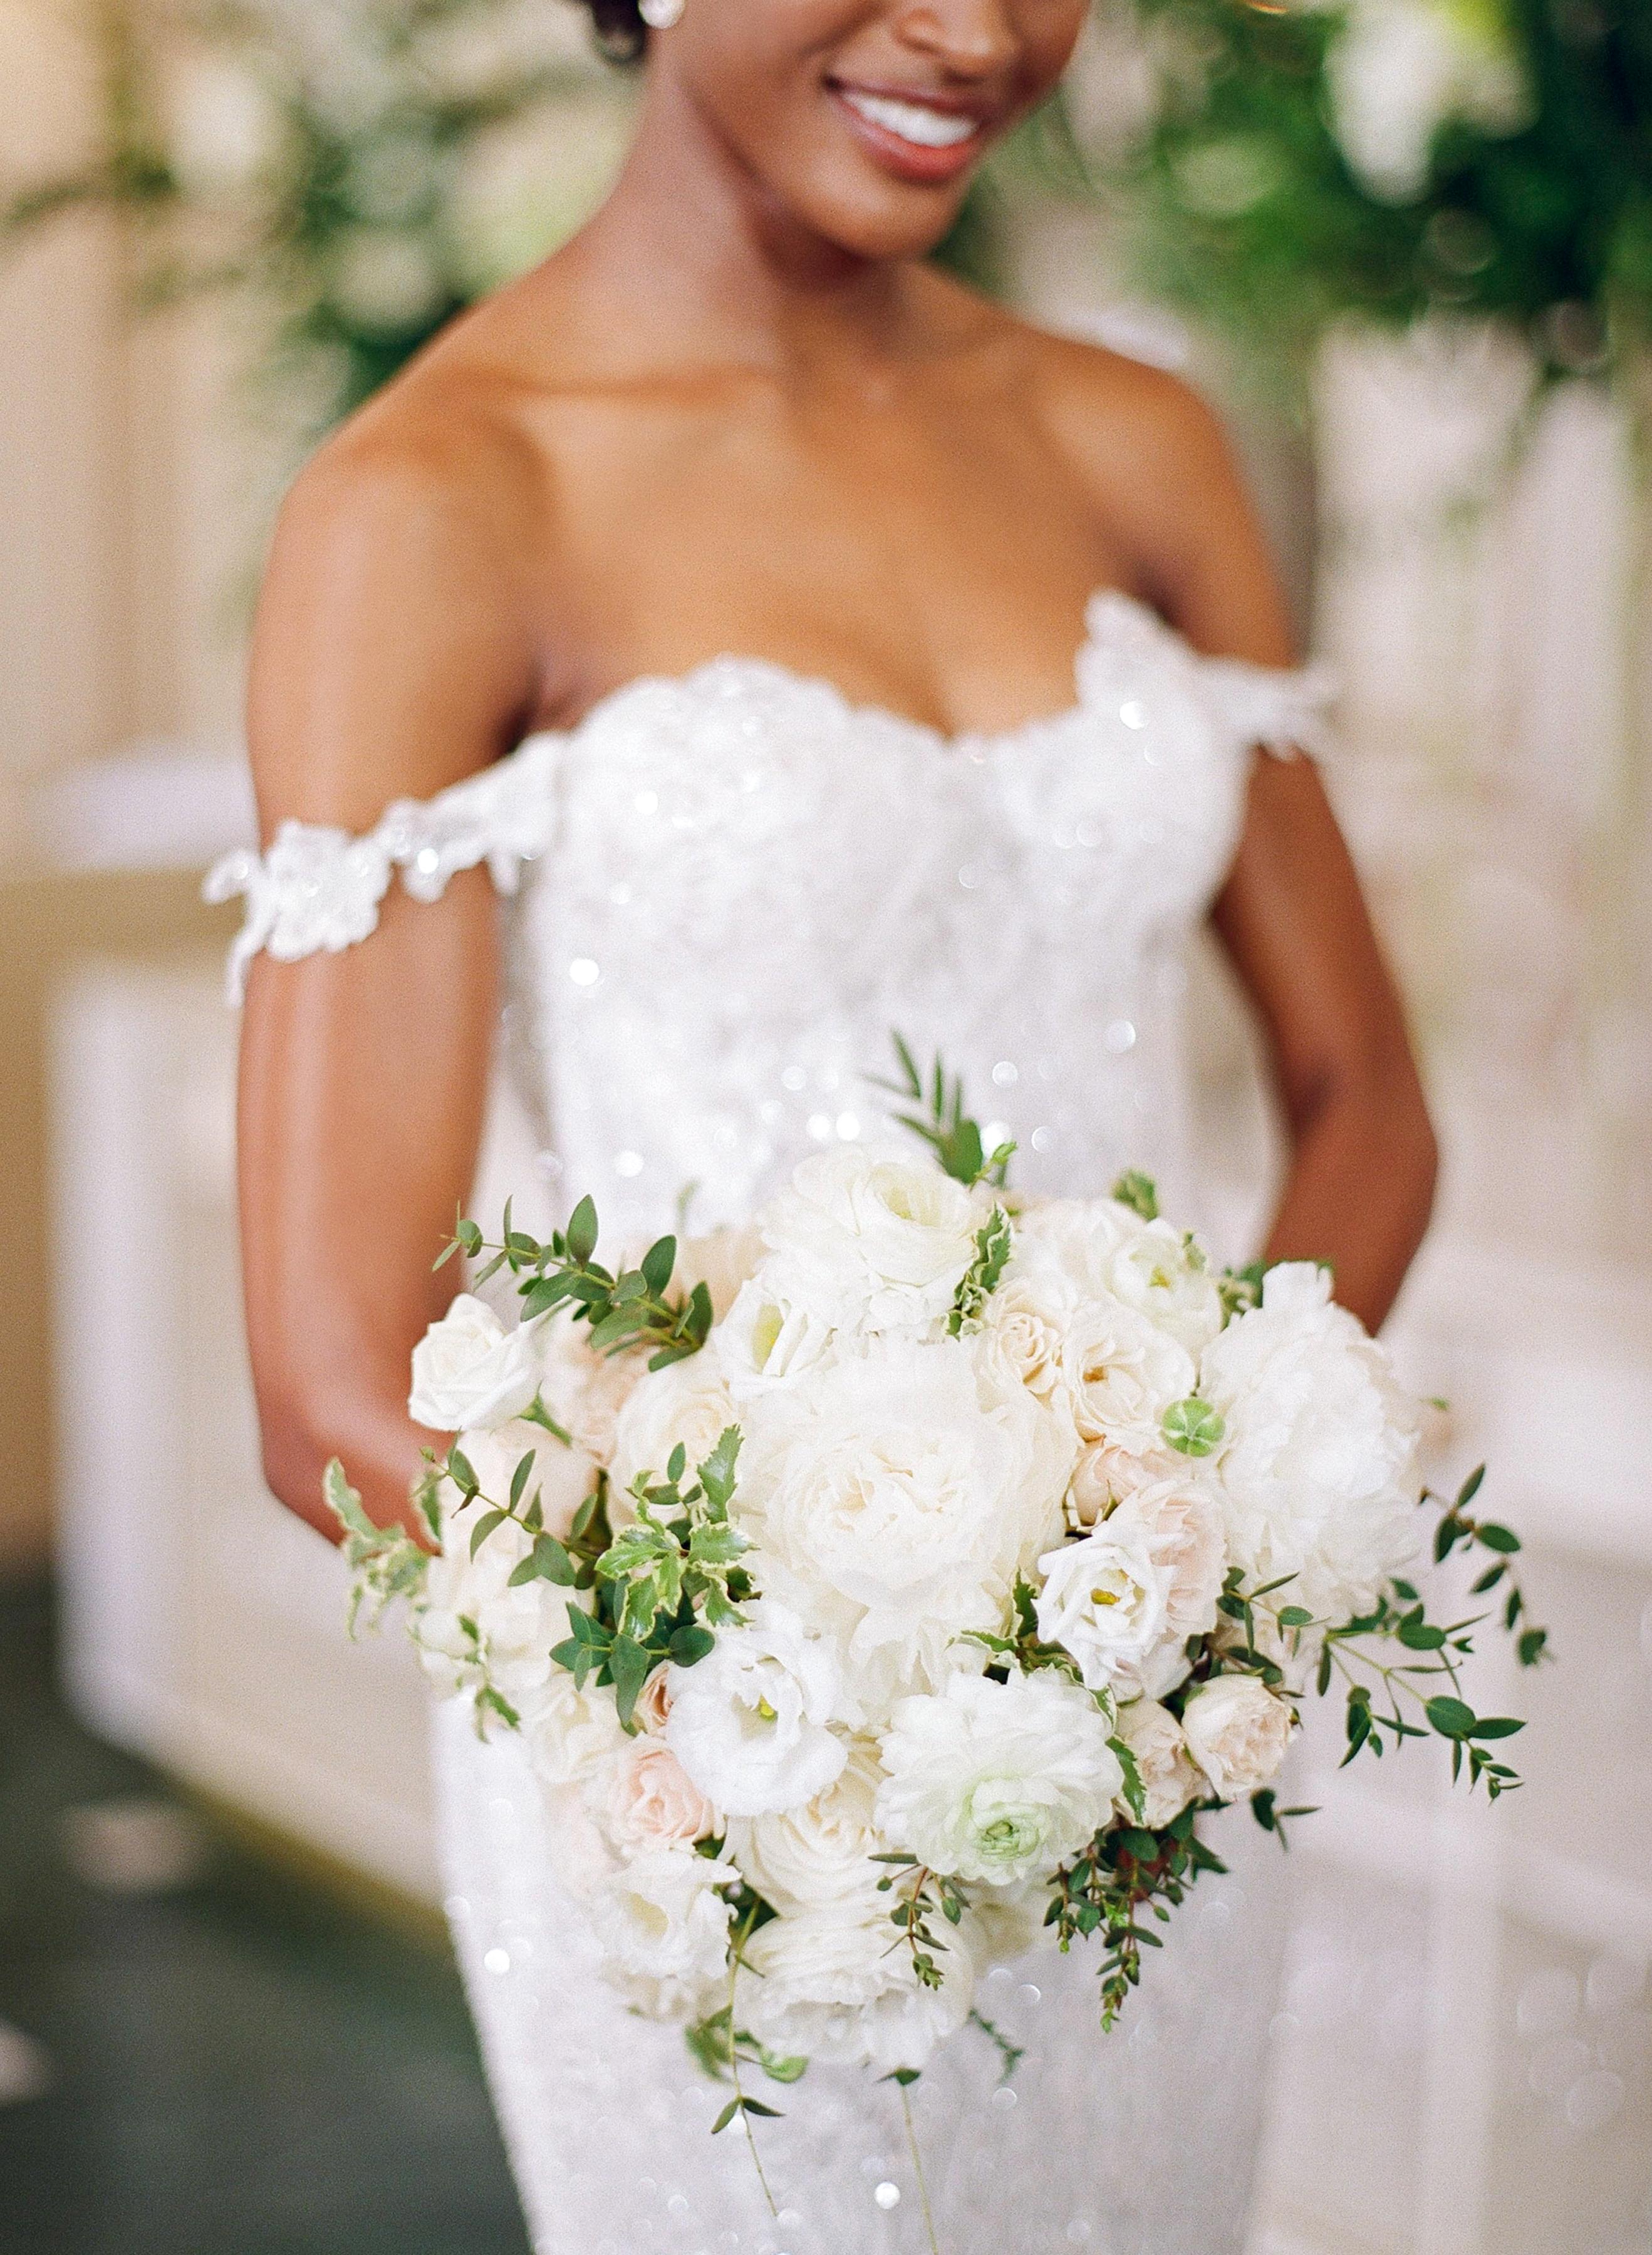 olivia collin wedding bride with bouquet